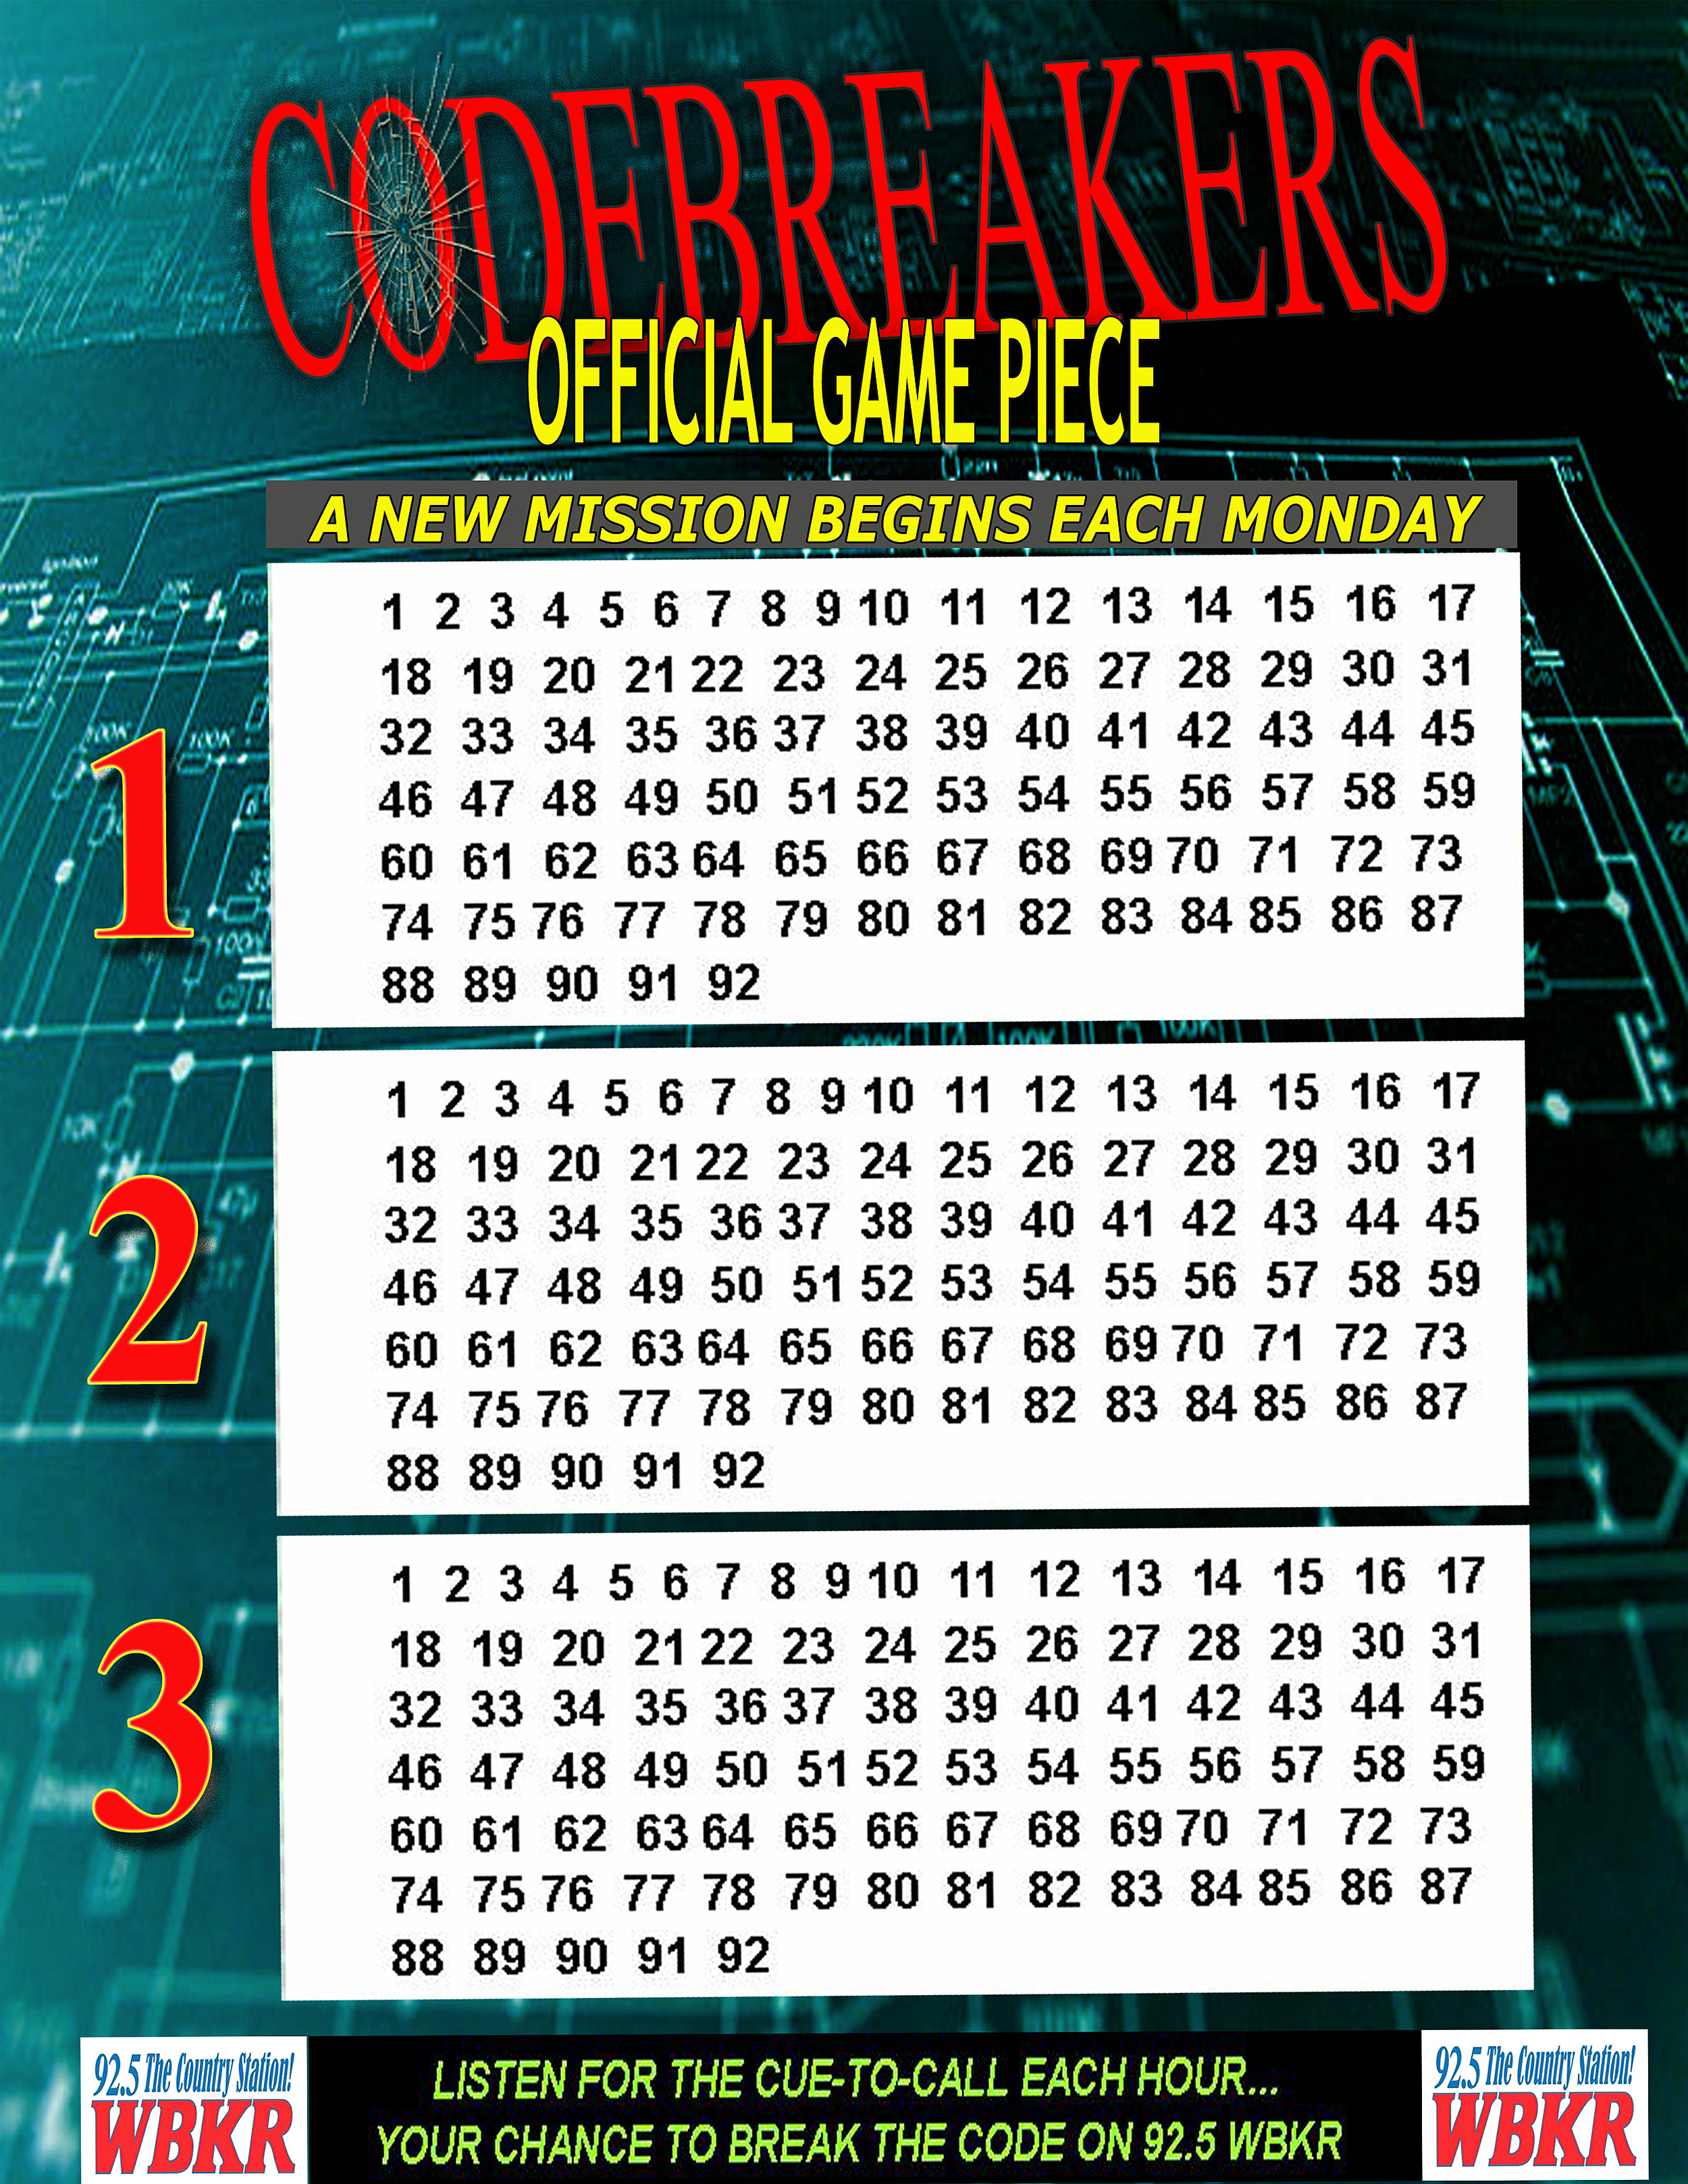 Codebreakers Game Piece spy2016 copy